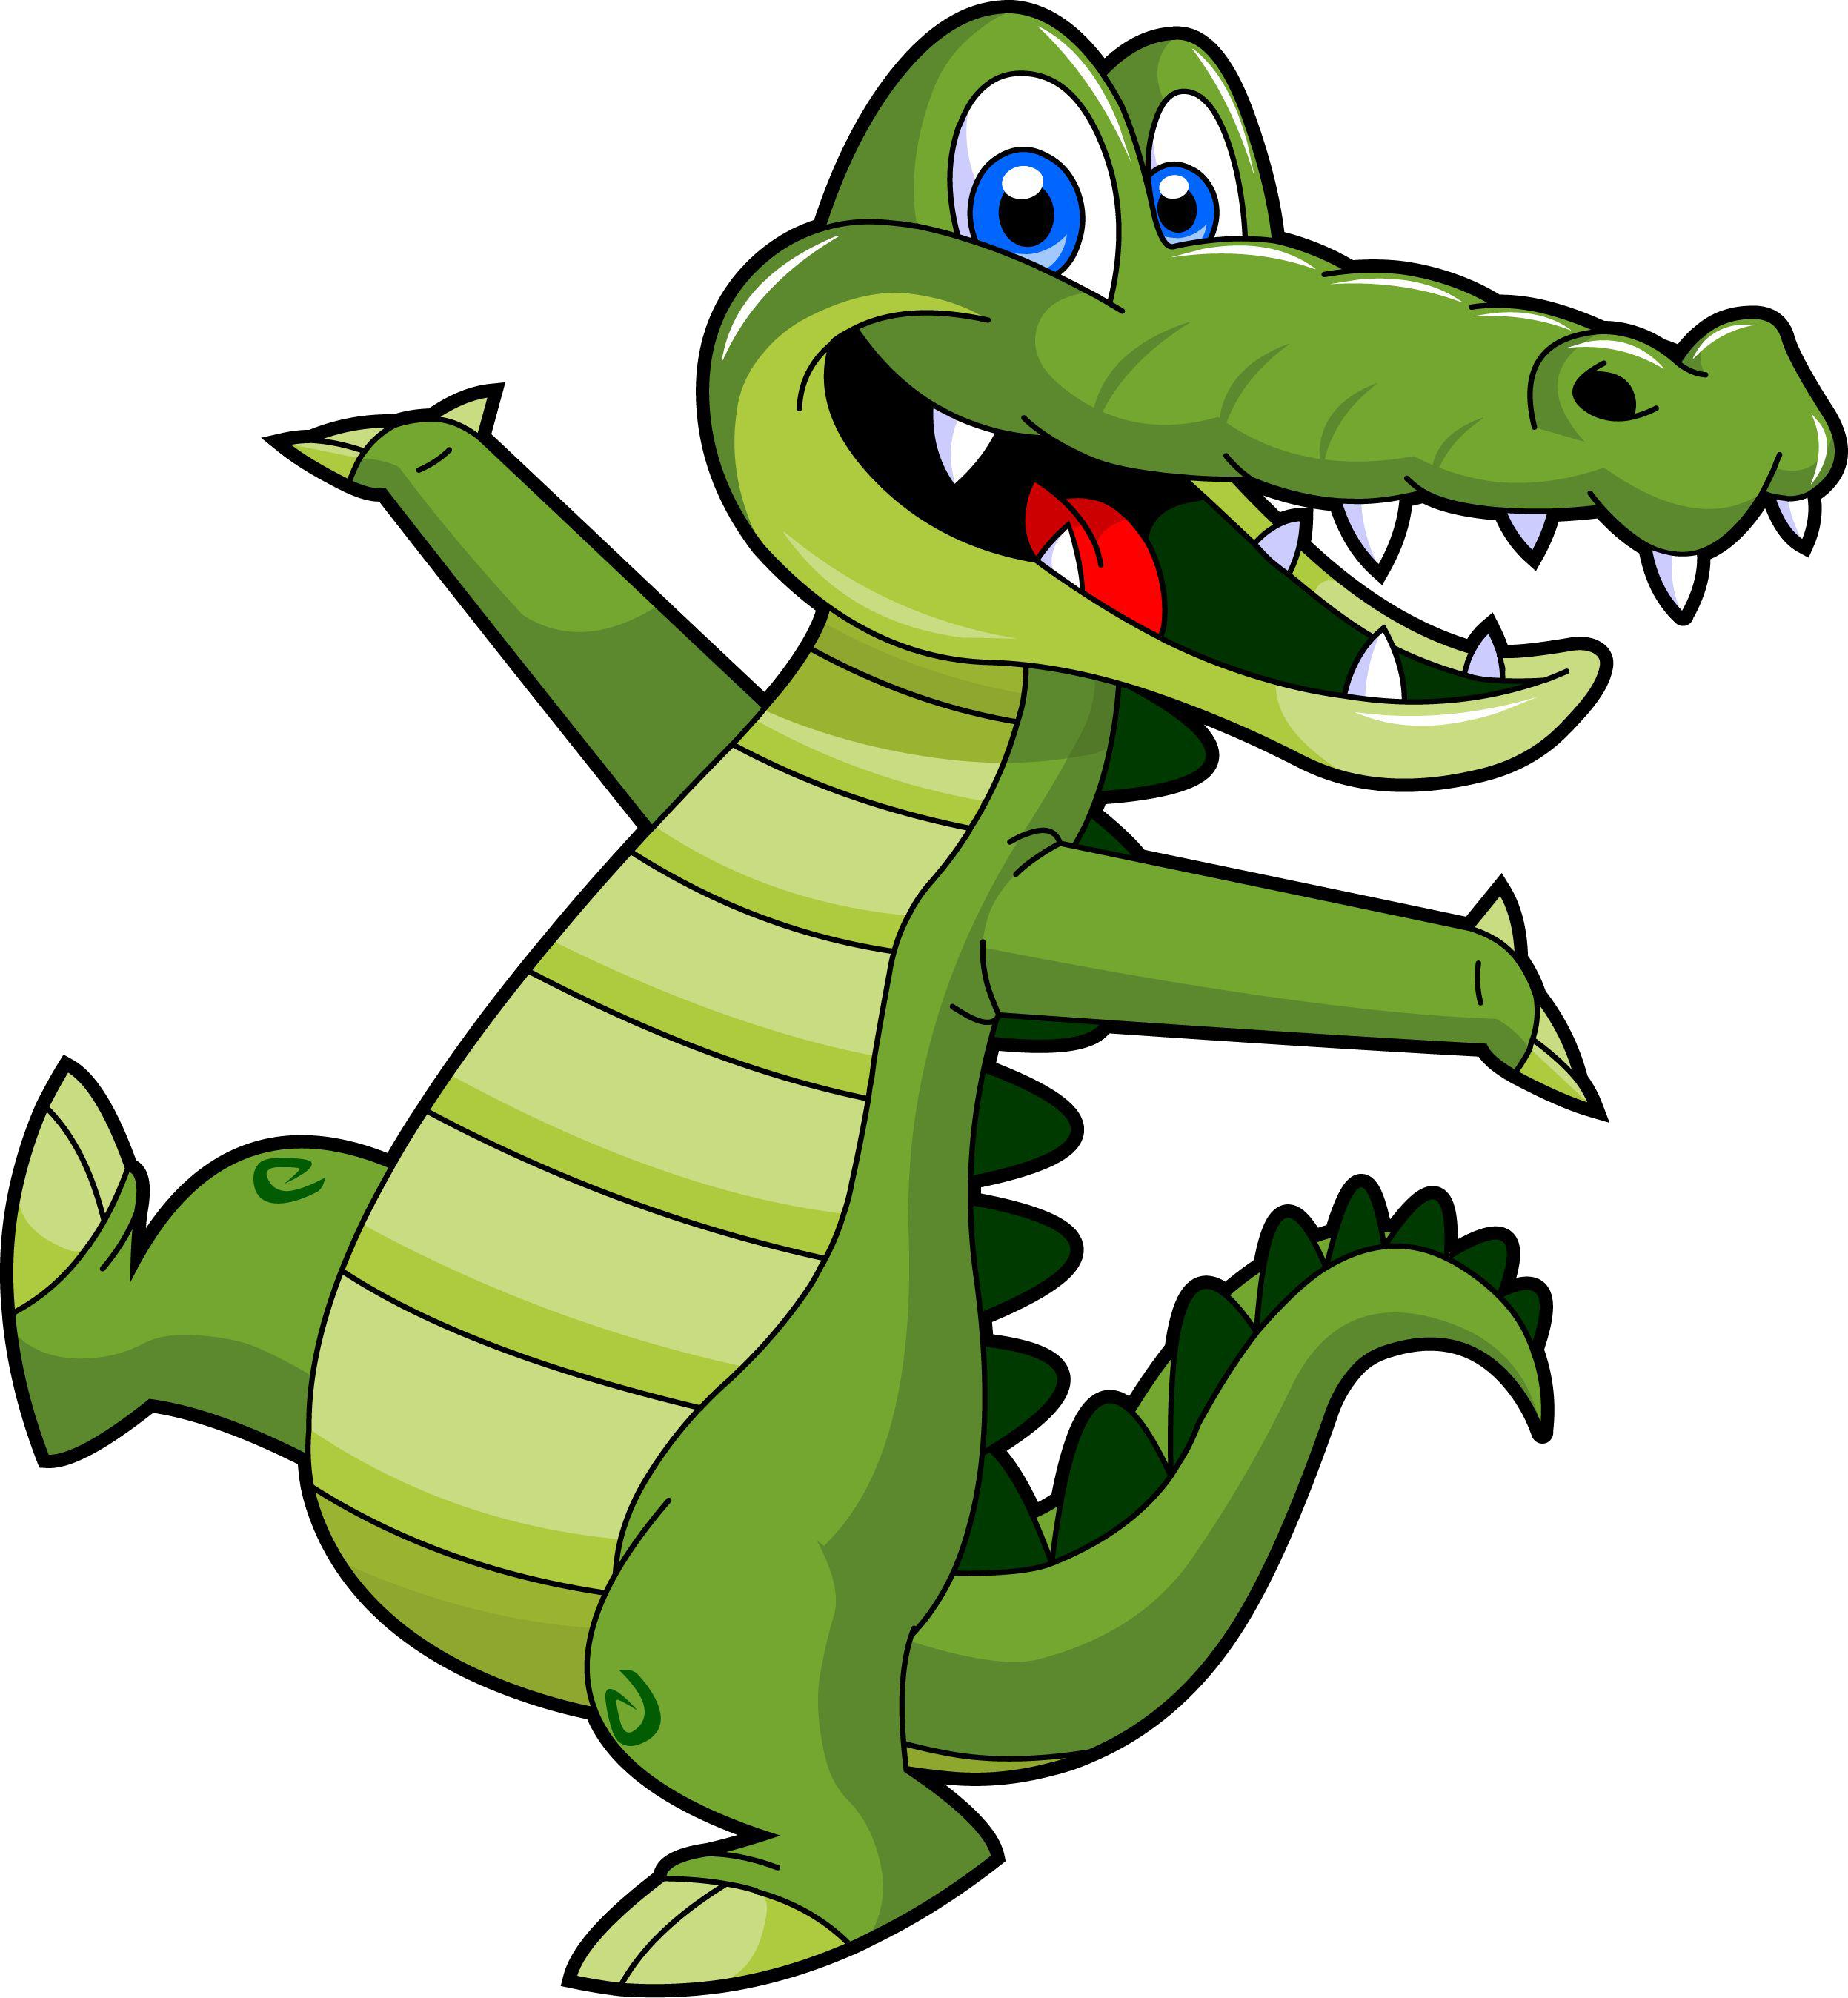 Halloween alligator pumpkin clipart freeuse stock Download Alligator Image HQ PNG Image   FreePNGImg freeuse stock